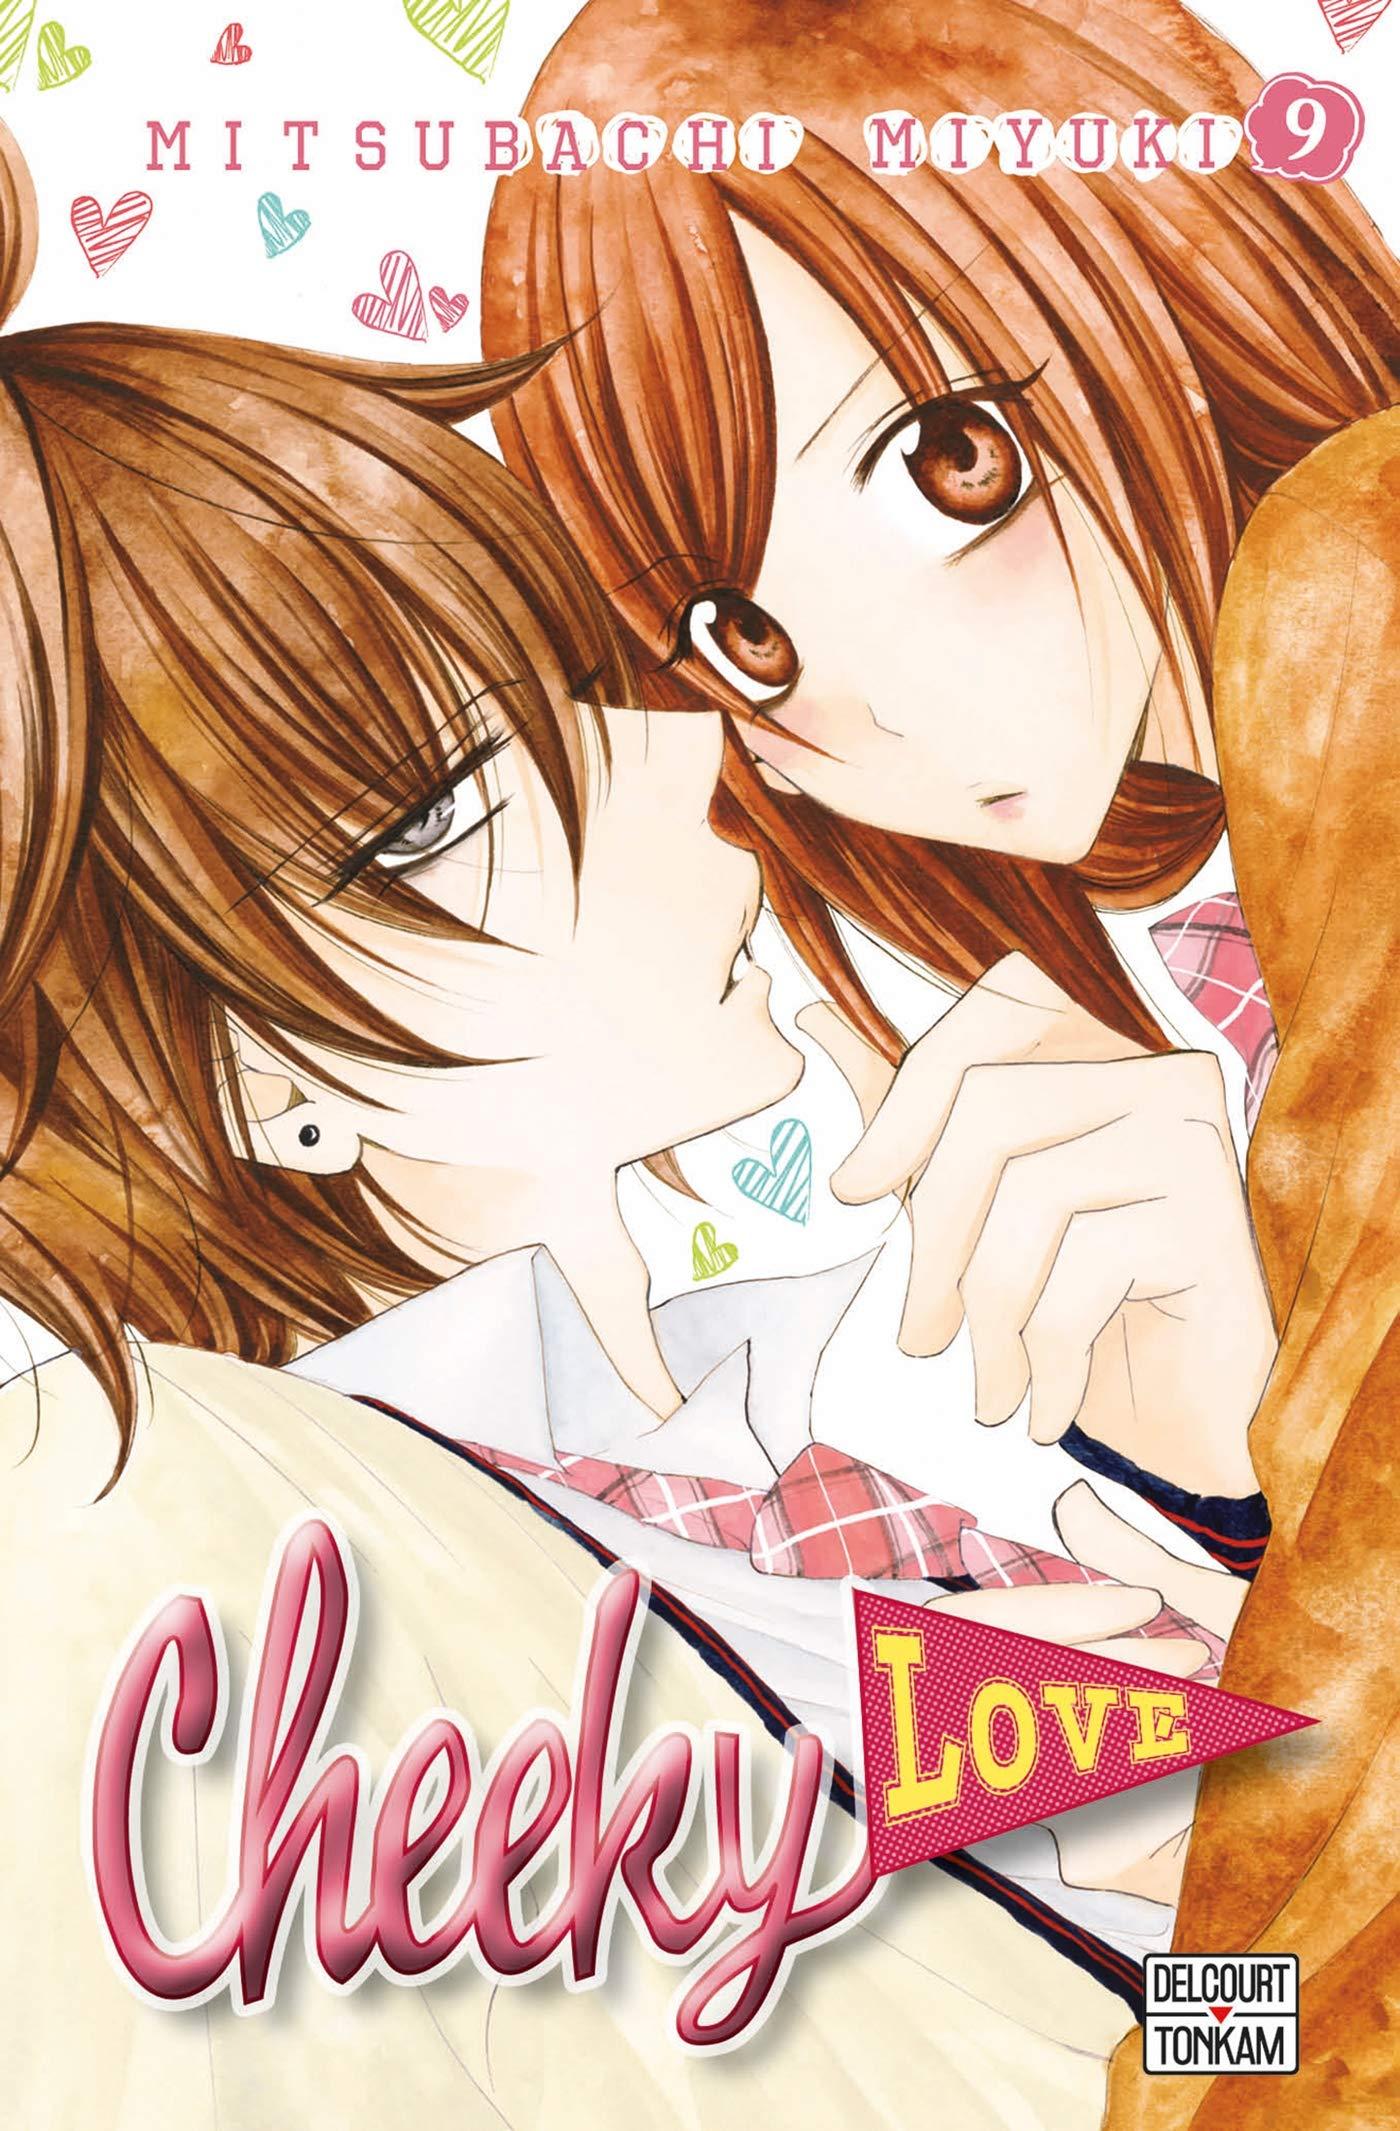 Cheeky love 9